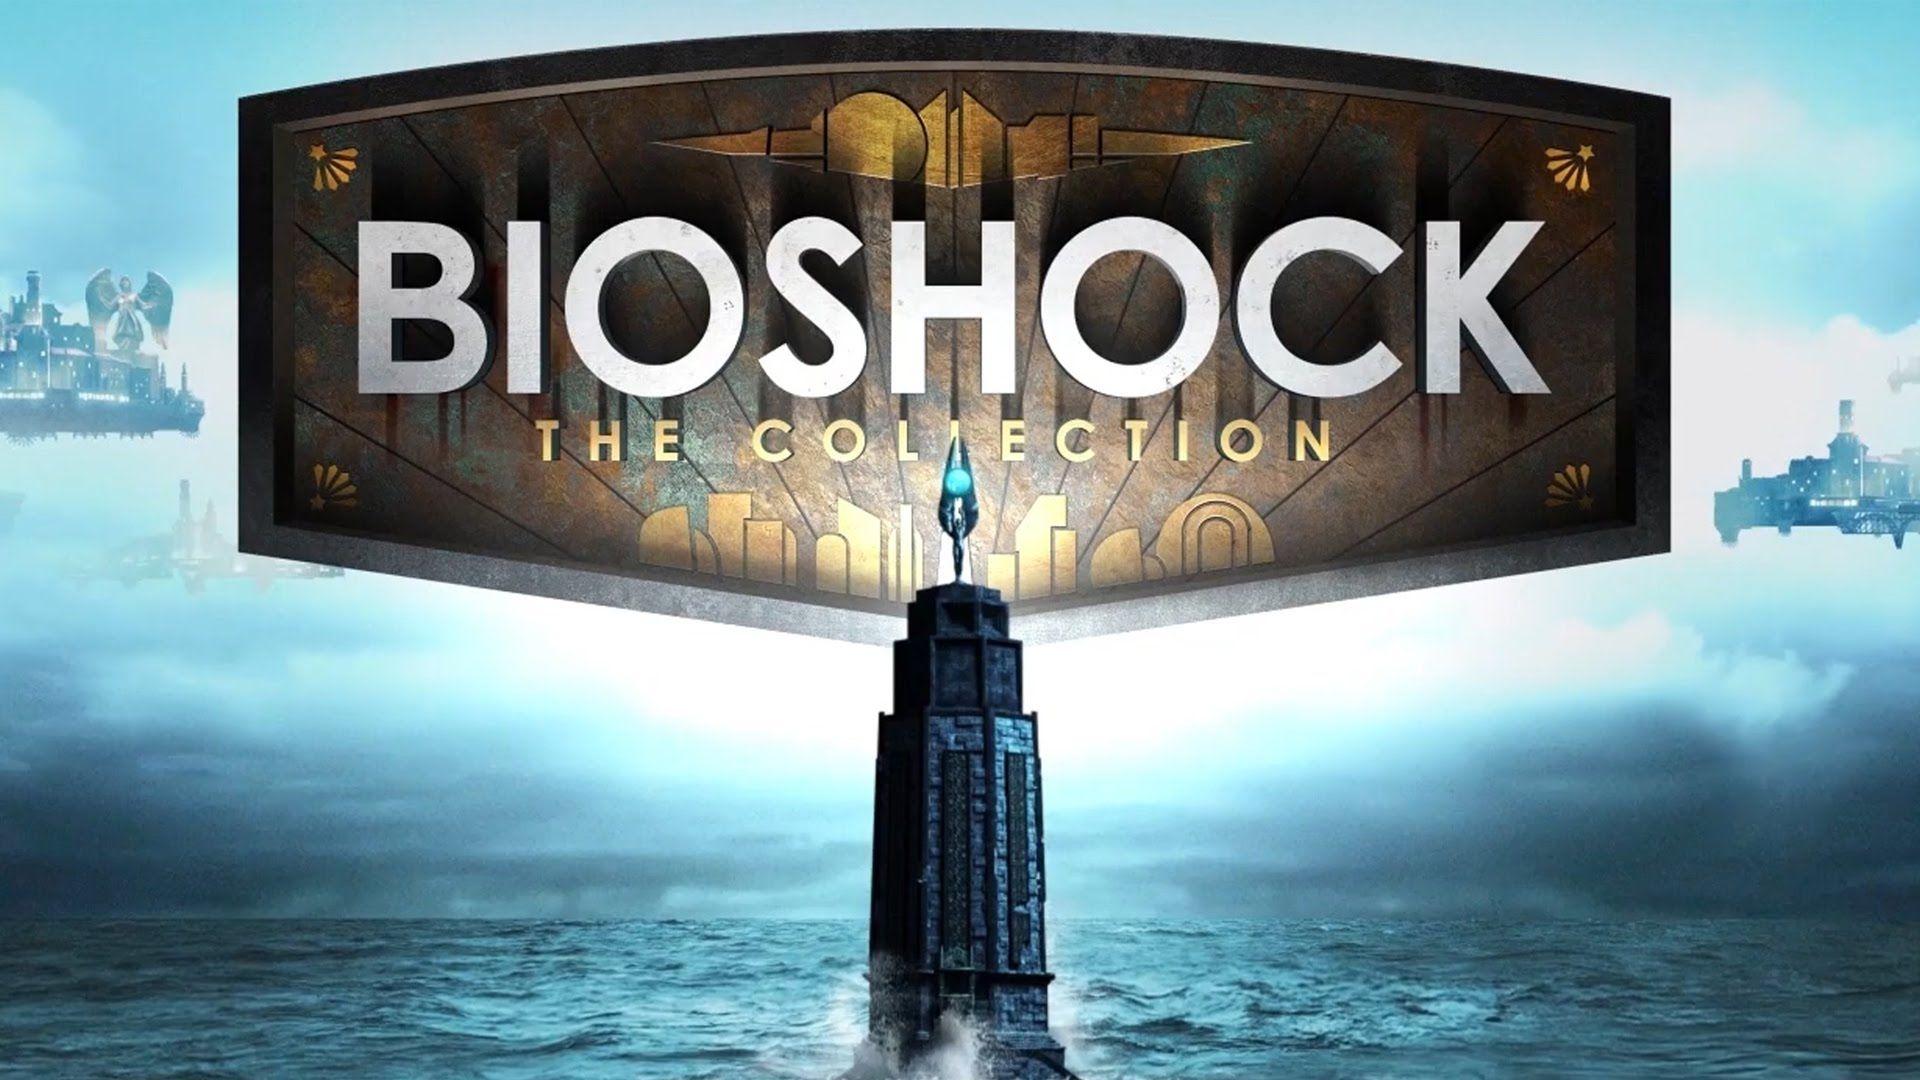 Mas Vale Tarde Que Nunca Media Hora De Gameplay De Bioshock The Collection Http Bit Ly 2byr7ib Bioshock Bioshock Collection Video Game News